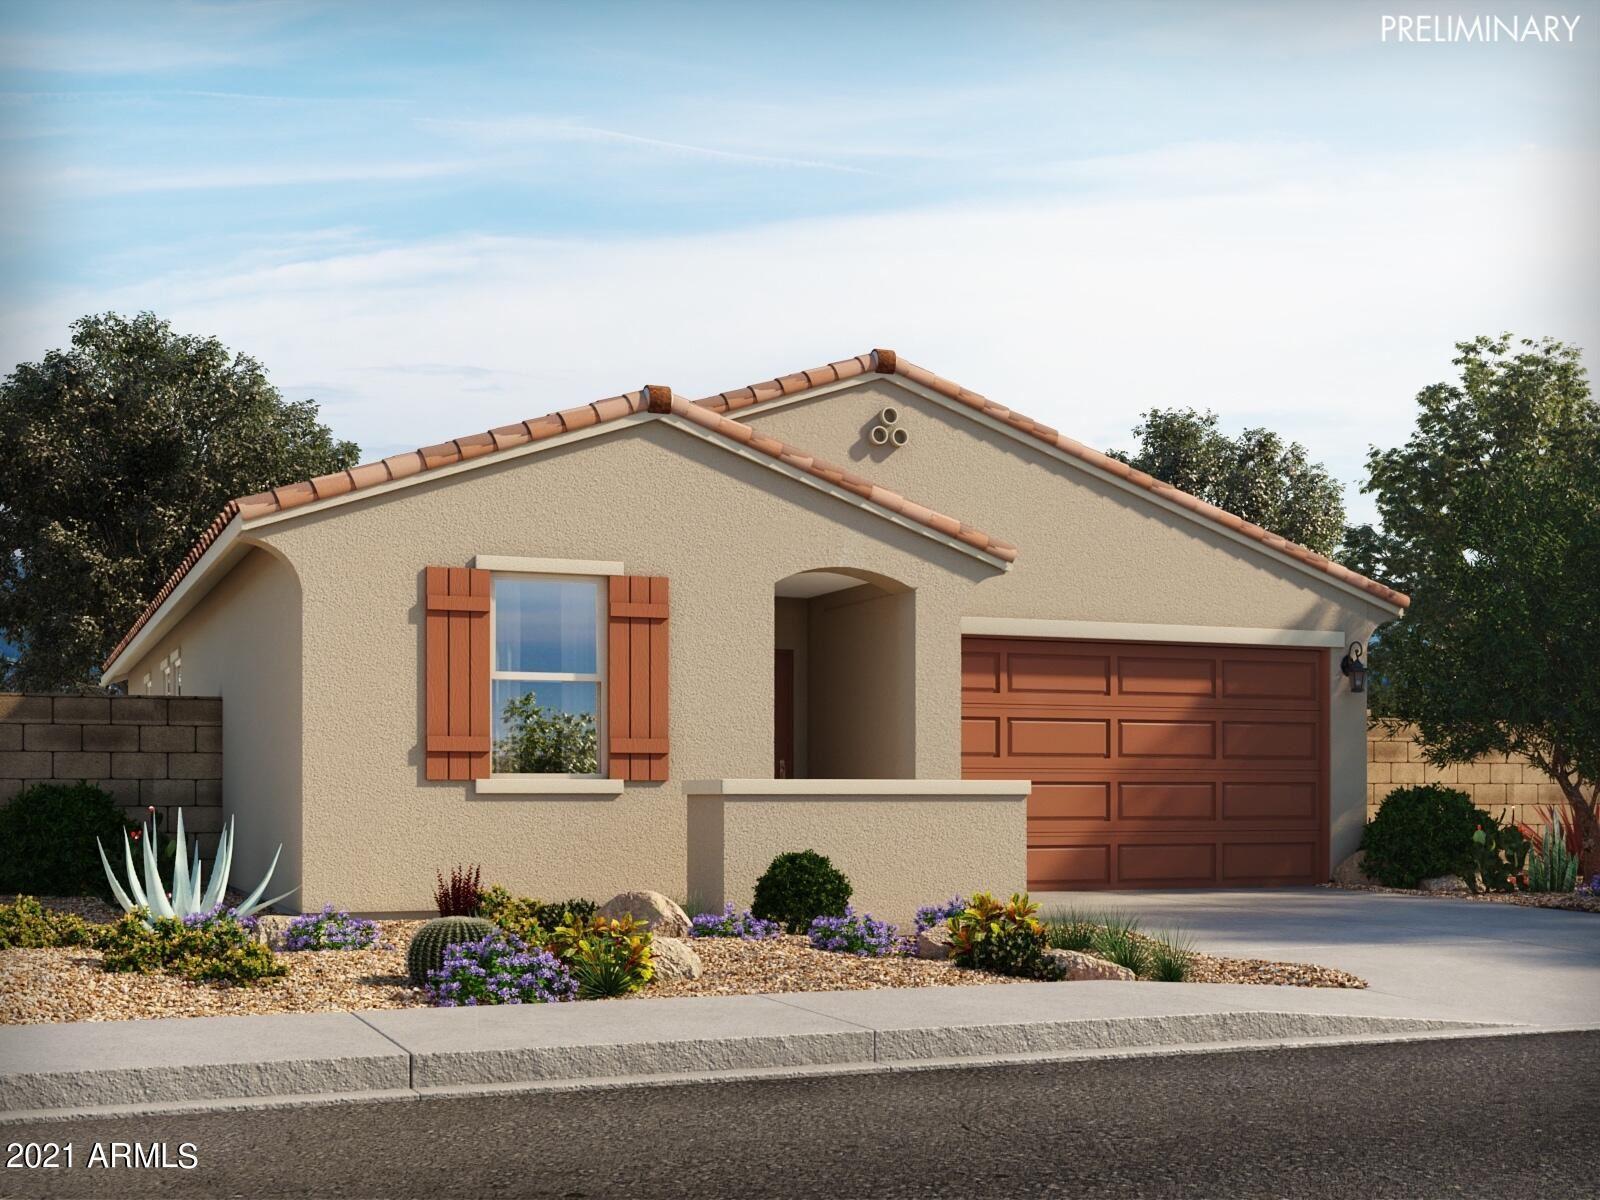 Photo of 5635 W JACKALOPE Lane, Laveen, AZ 85339 (MLS # 6272020)